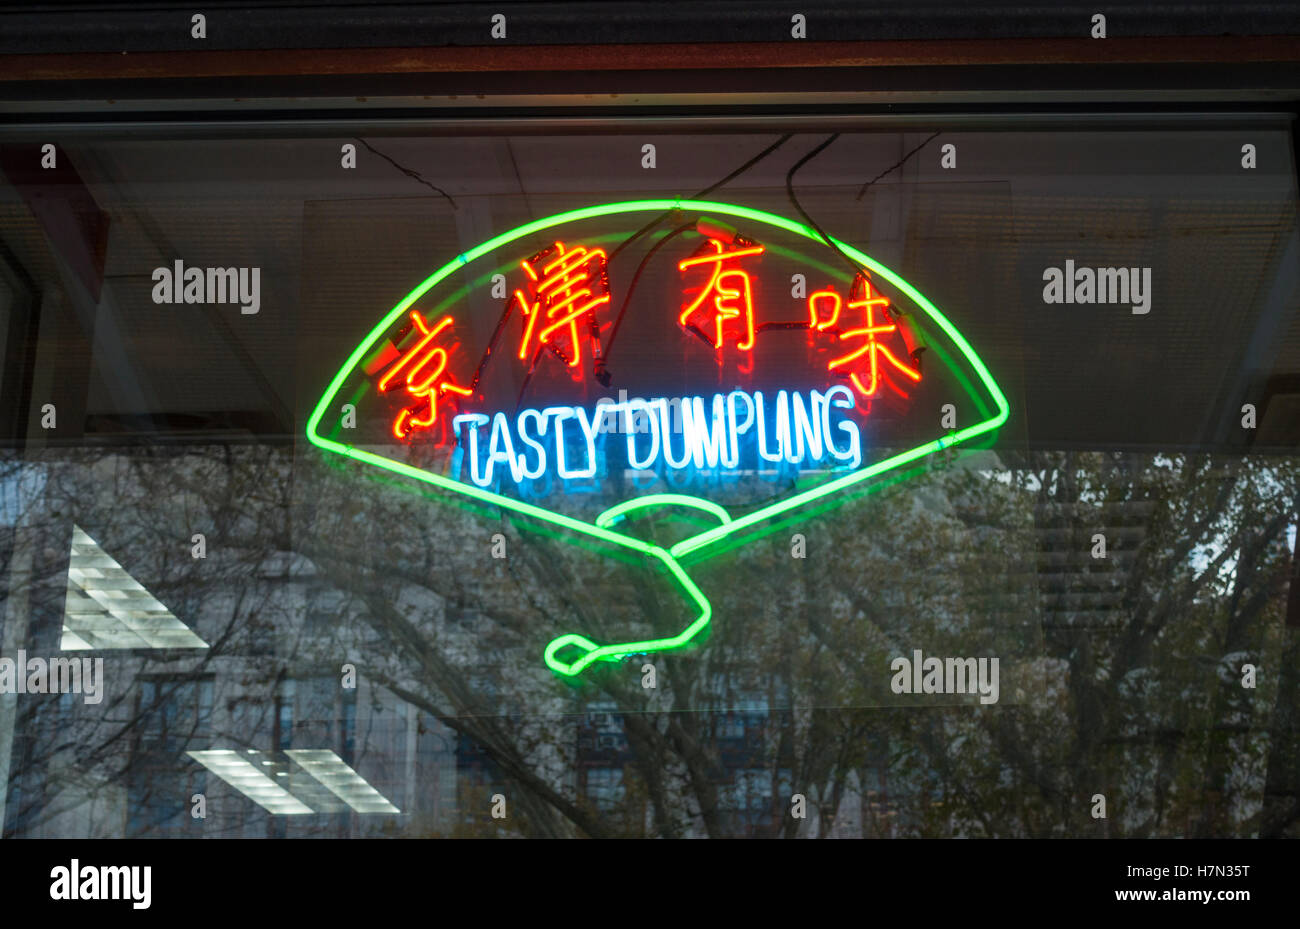 Neon sign in the window of Tasty Dumpling restaurant in Chinatown, New York City - Stock Image